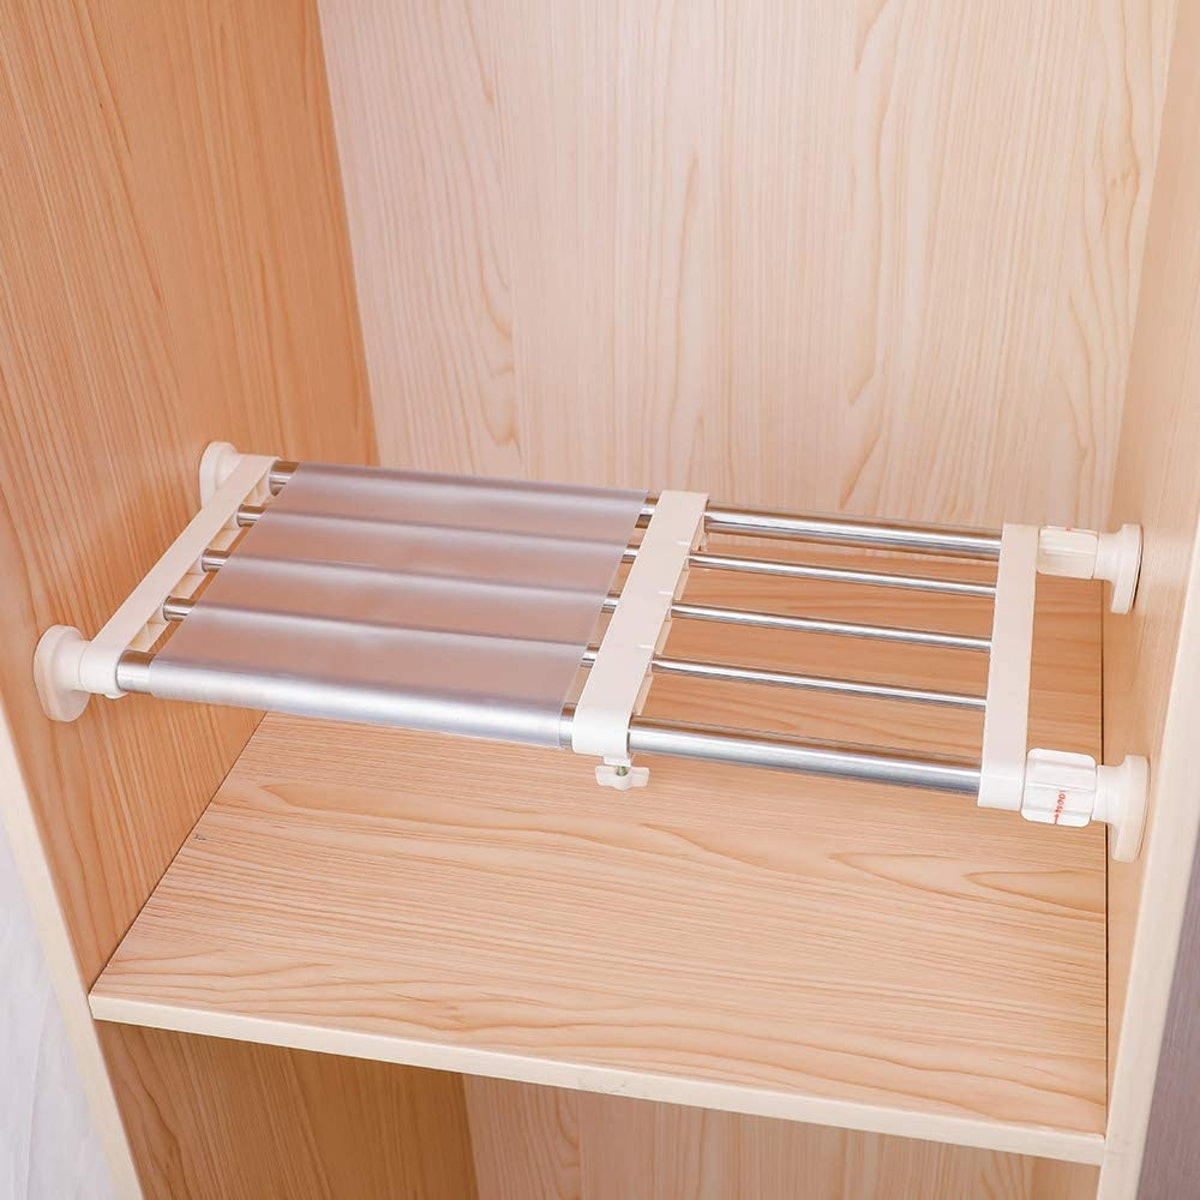 Hershii Tension Shelf